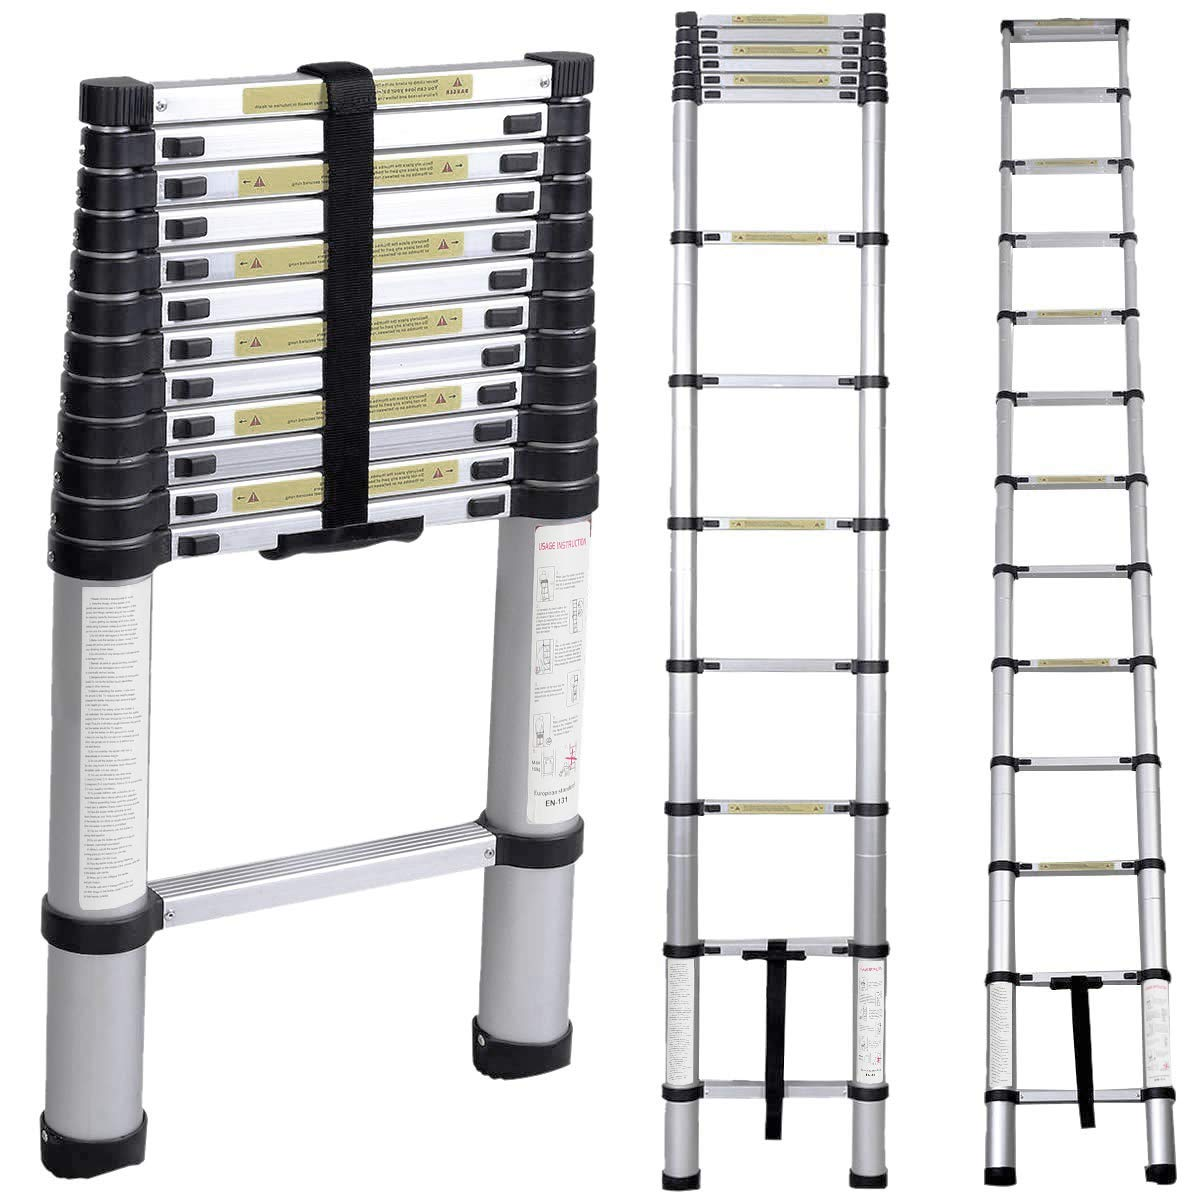 Soges 12.5ft Telescoping Extension Ladder,12 Steps Aluminum Extendable Telescopic Ladder with Spring Loaded Locking Mechanism Non-Slip Ribbing 330 Pound Capacity EN131 Certified, KS-JF-001